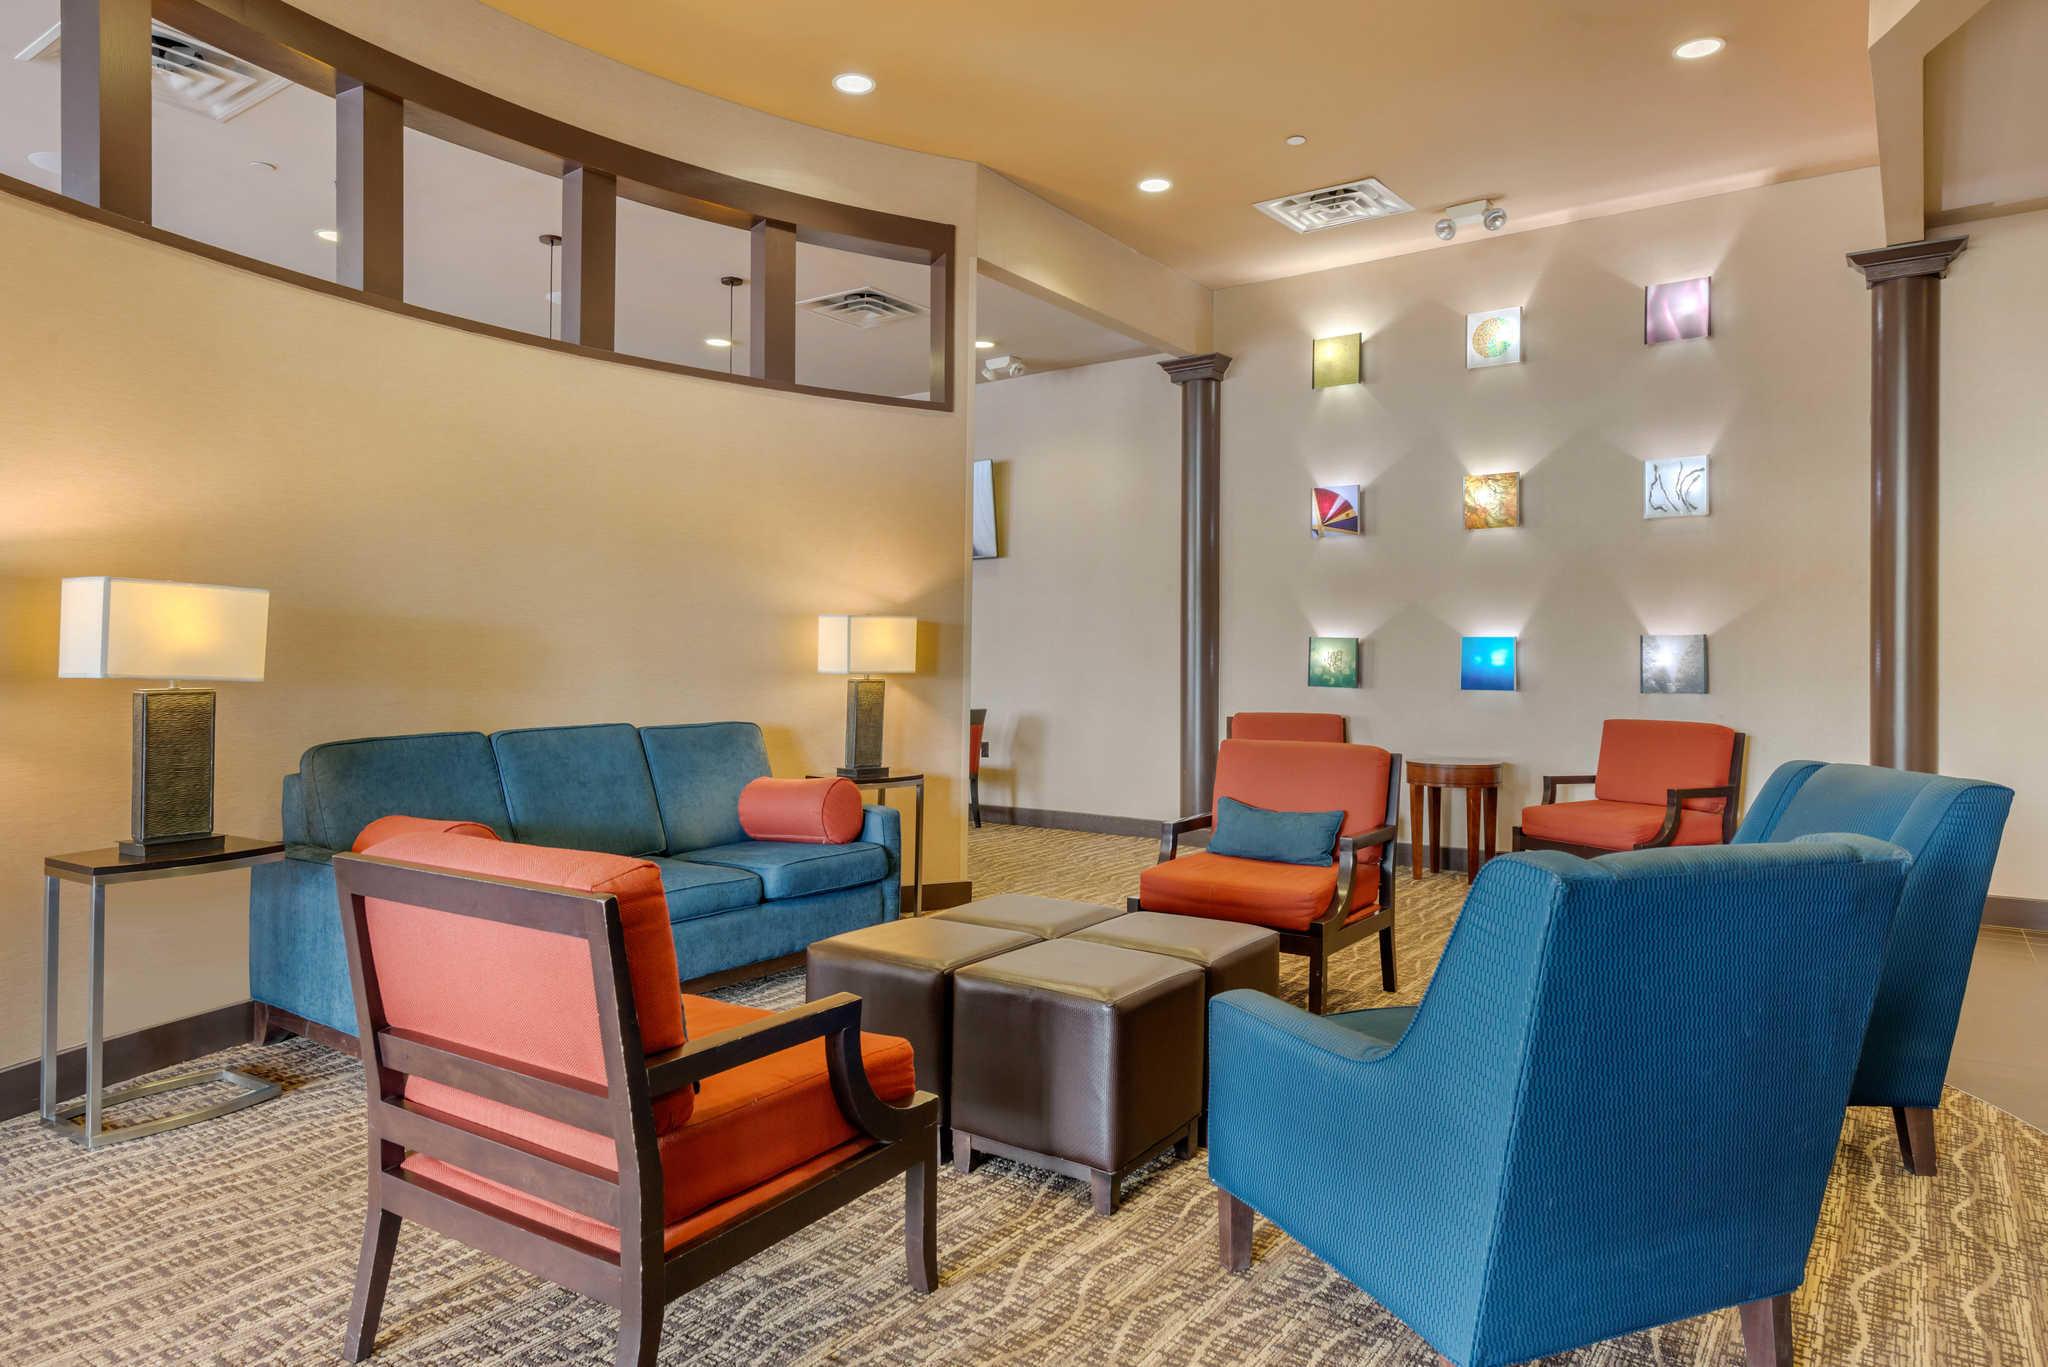 Comfort Inn DFW Airport North image 8